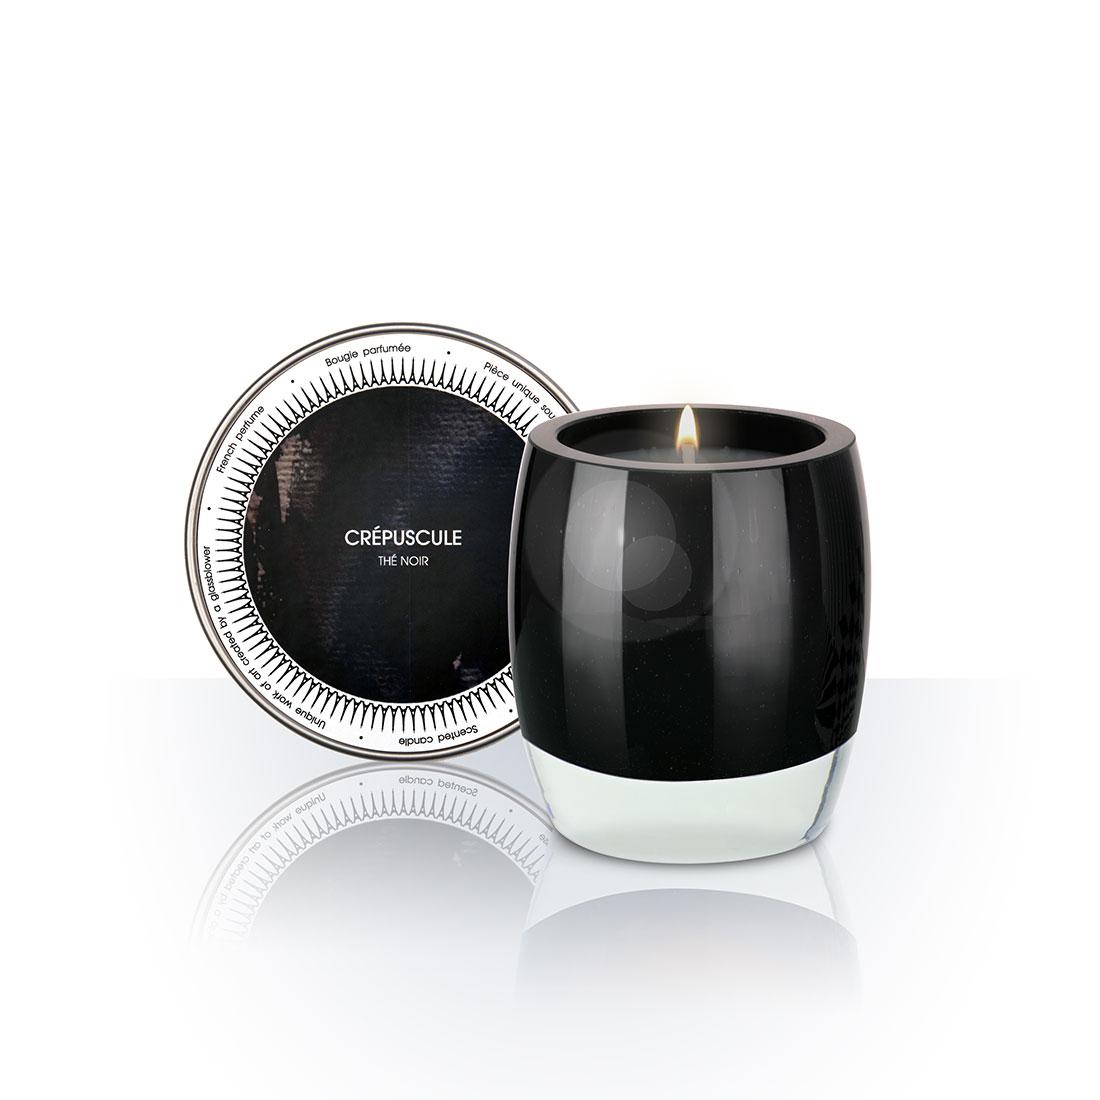 Bougie Parfumée Crepuscule Marianne Guedin